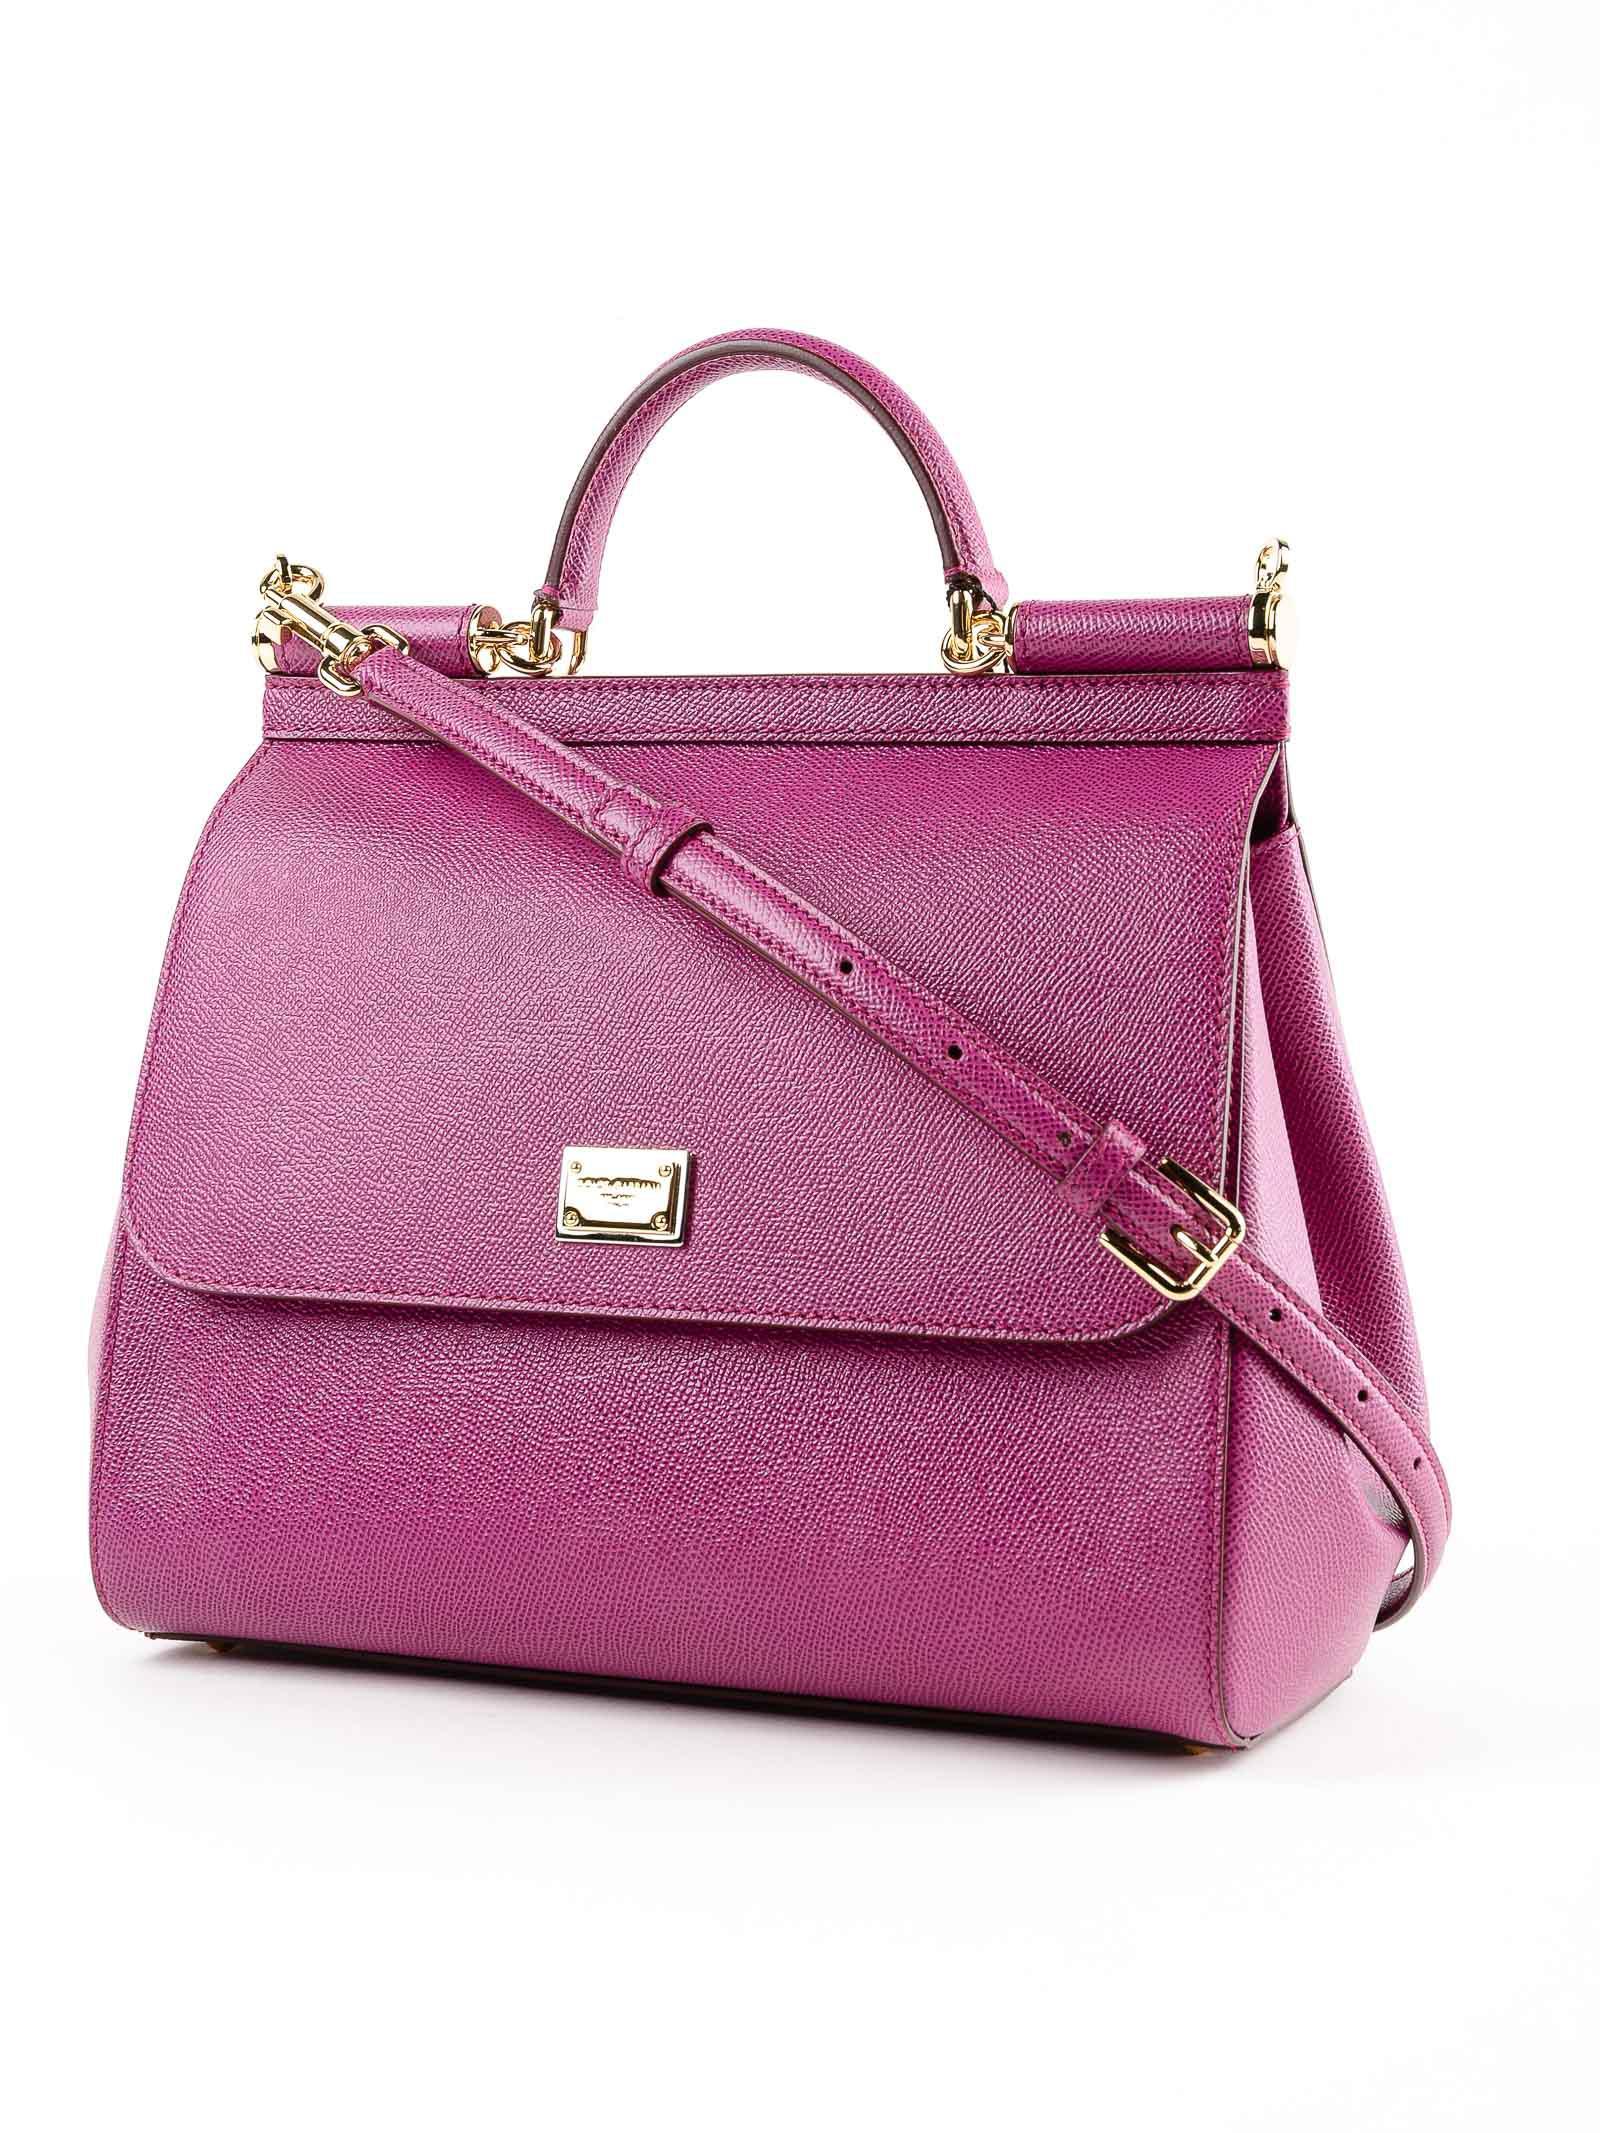 4210836db56 ... Lyst - Dolce Gabbana St.dauphine Handbag in Purple quality design 699ad  6dffd ...